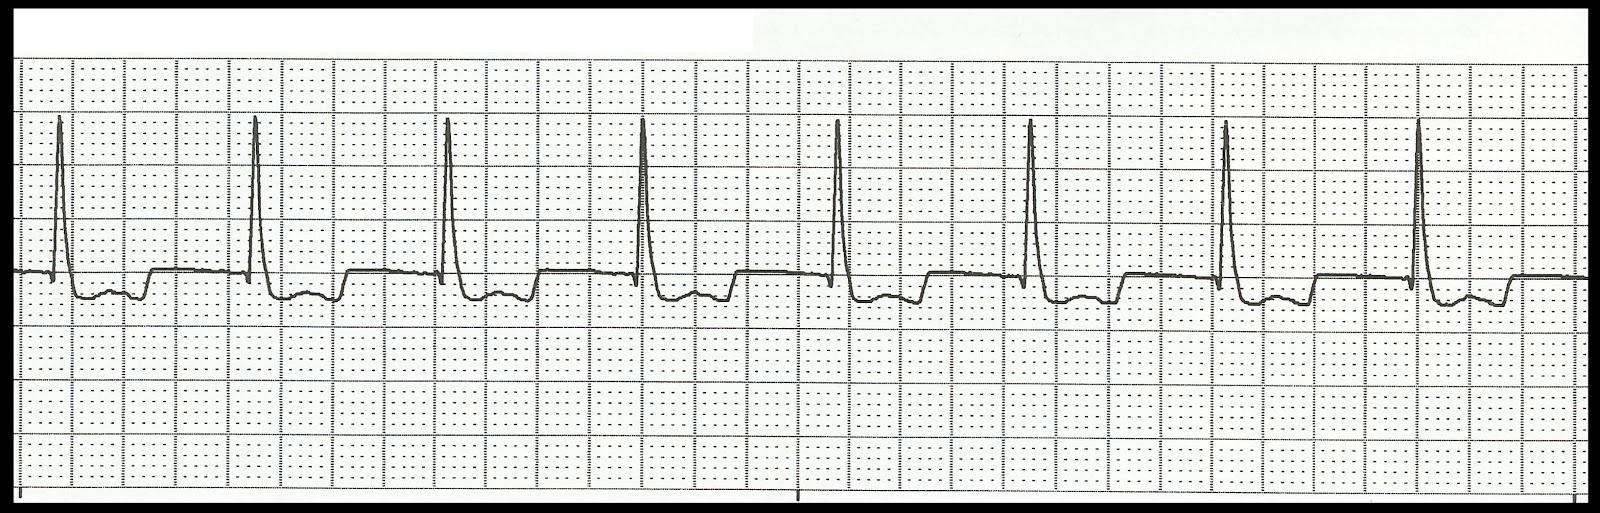 Float Nurse: Basic EKG Rhythm Test 06